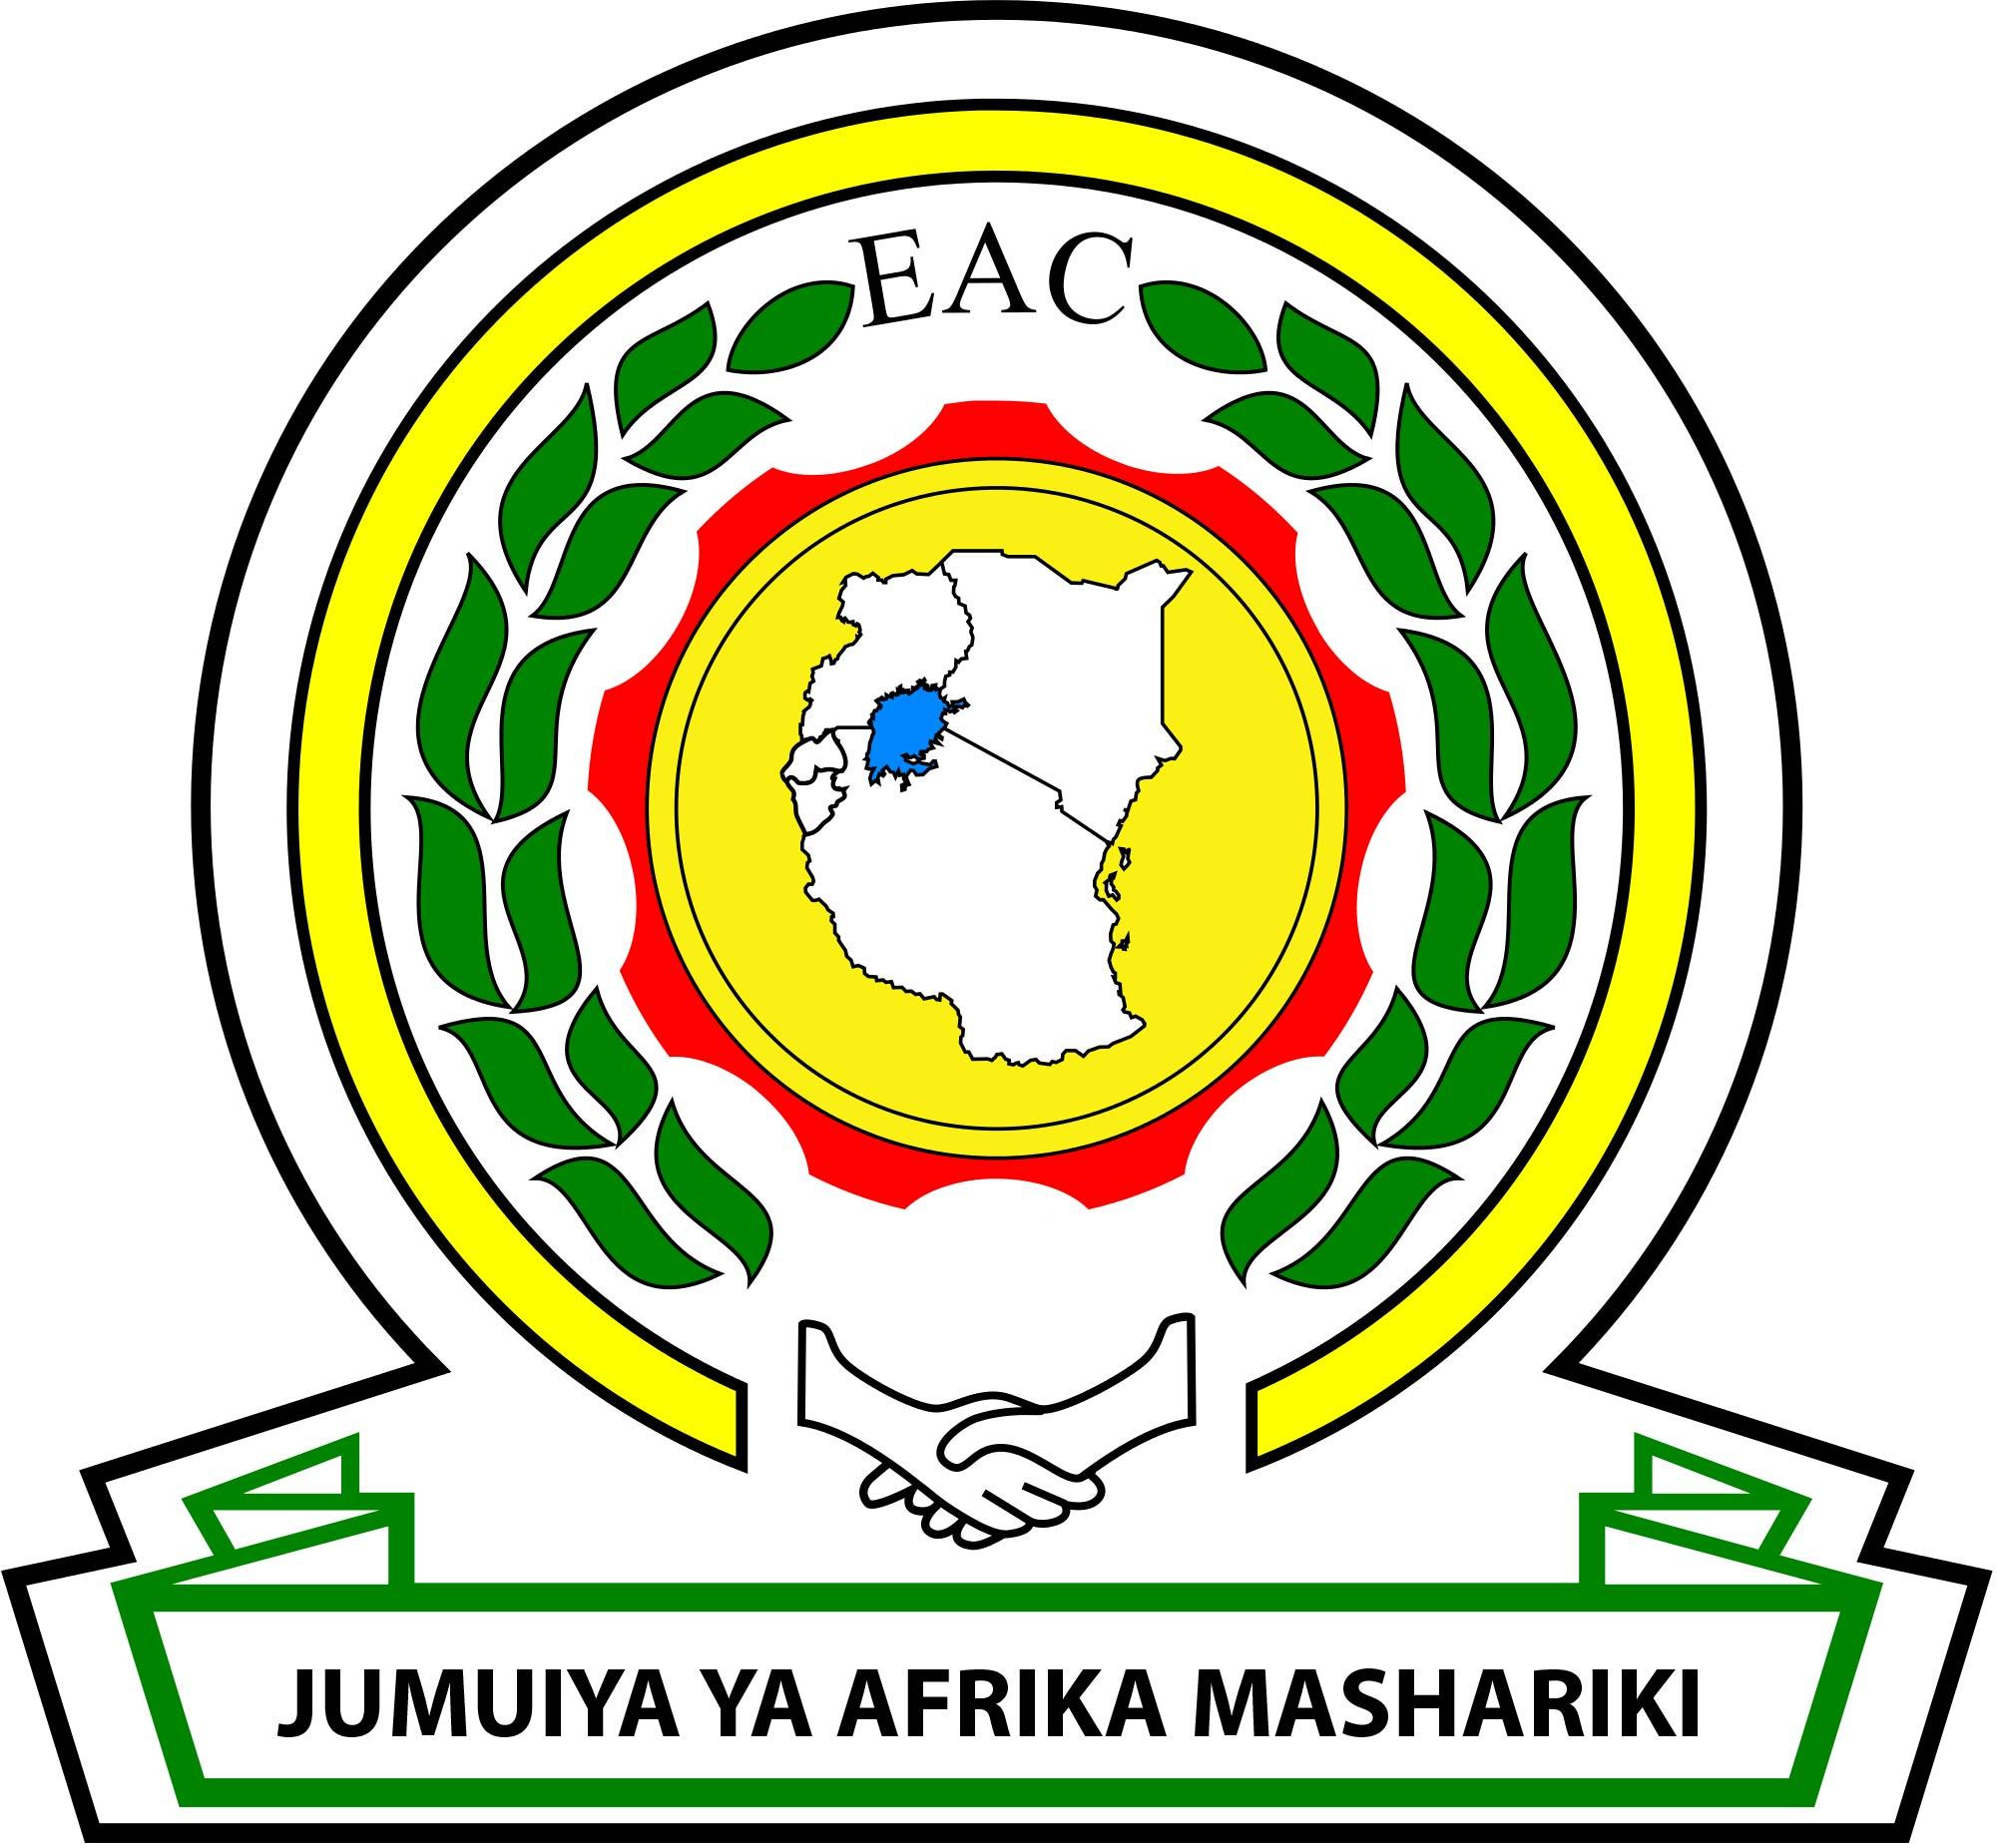 Emblem_of_East_African_Communitya